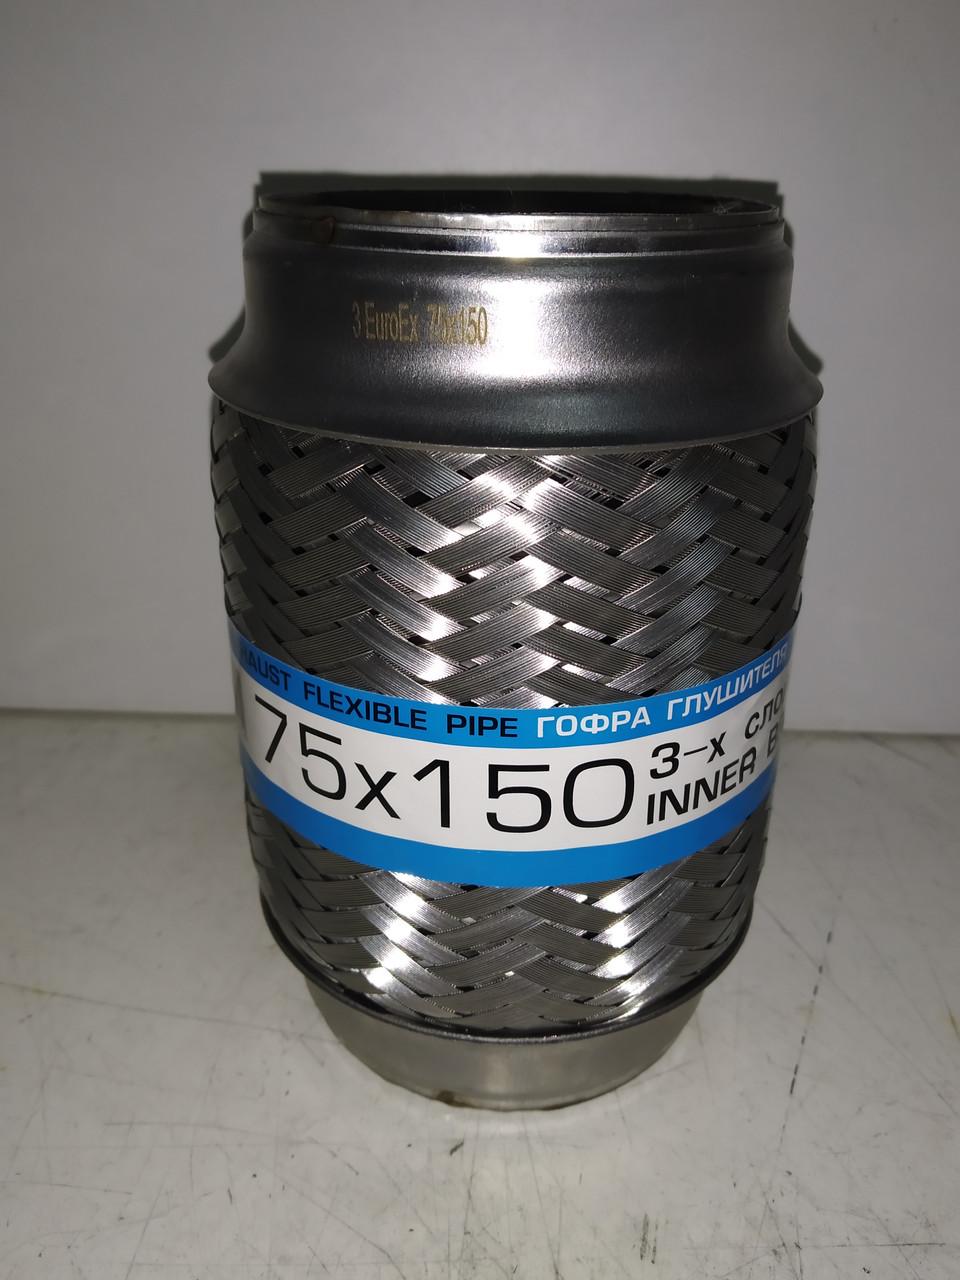 Гофра глушителя Euroex 75x150 3-х слойная